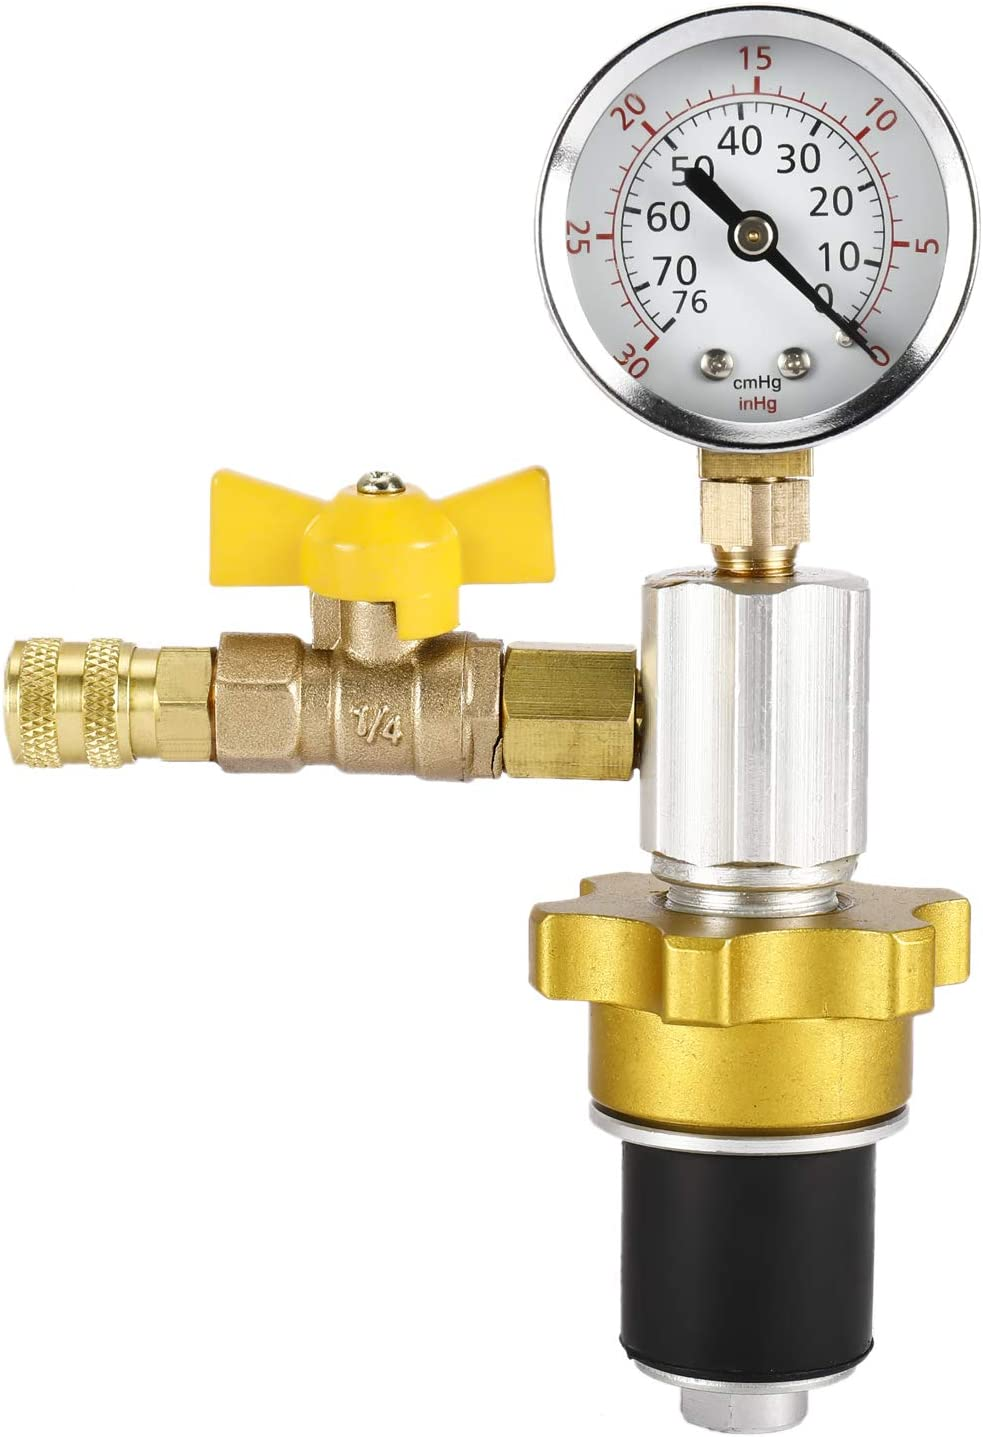 8MILELAKE Engine Cooling System Vacuum Radiator Purge /& Refill Tool Set